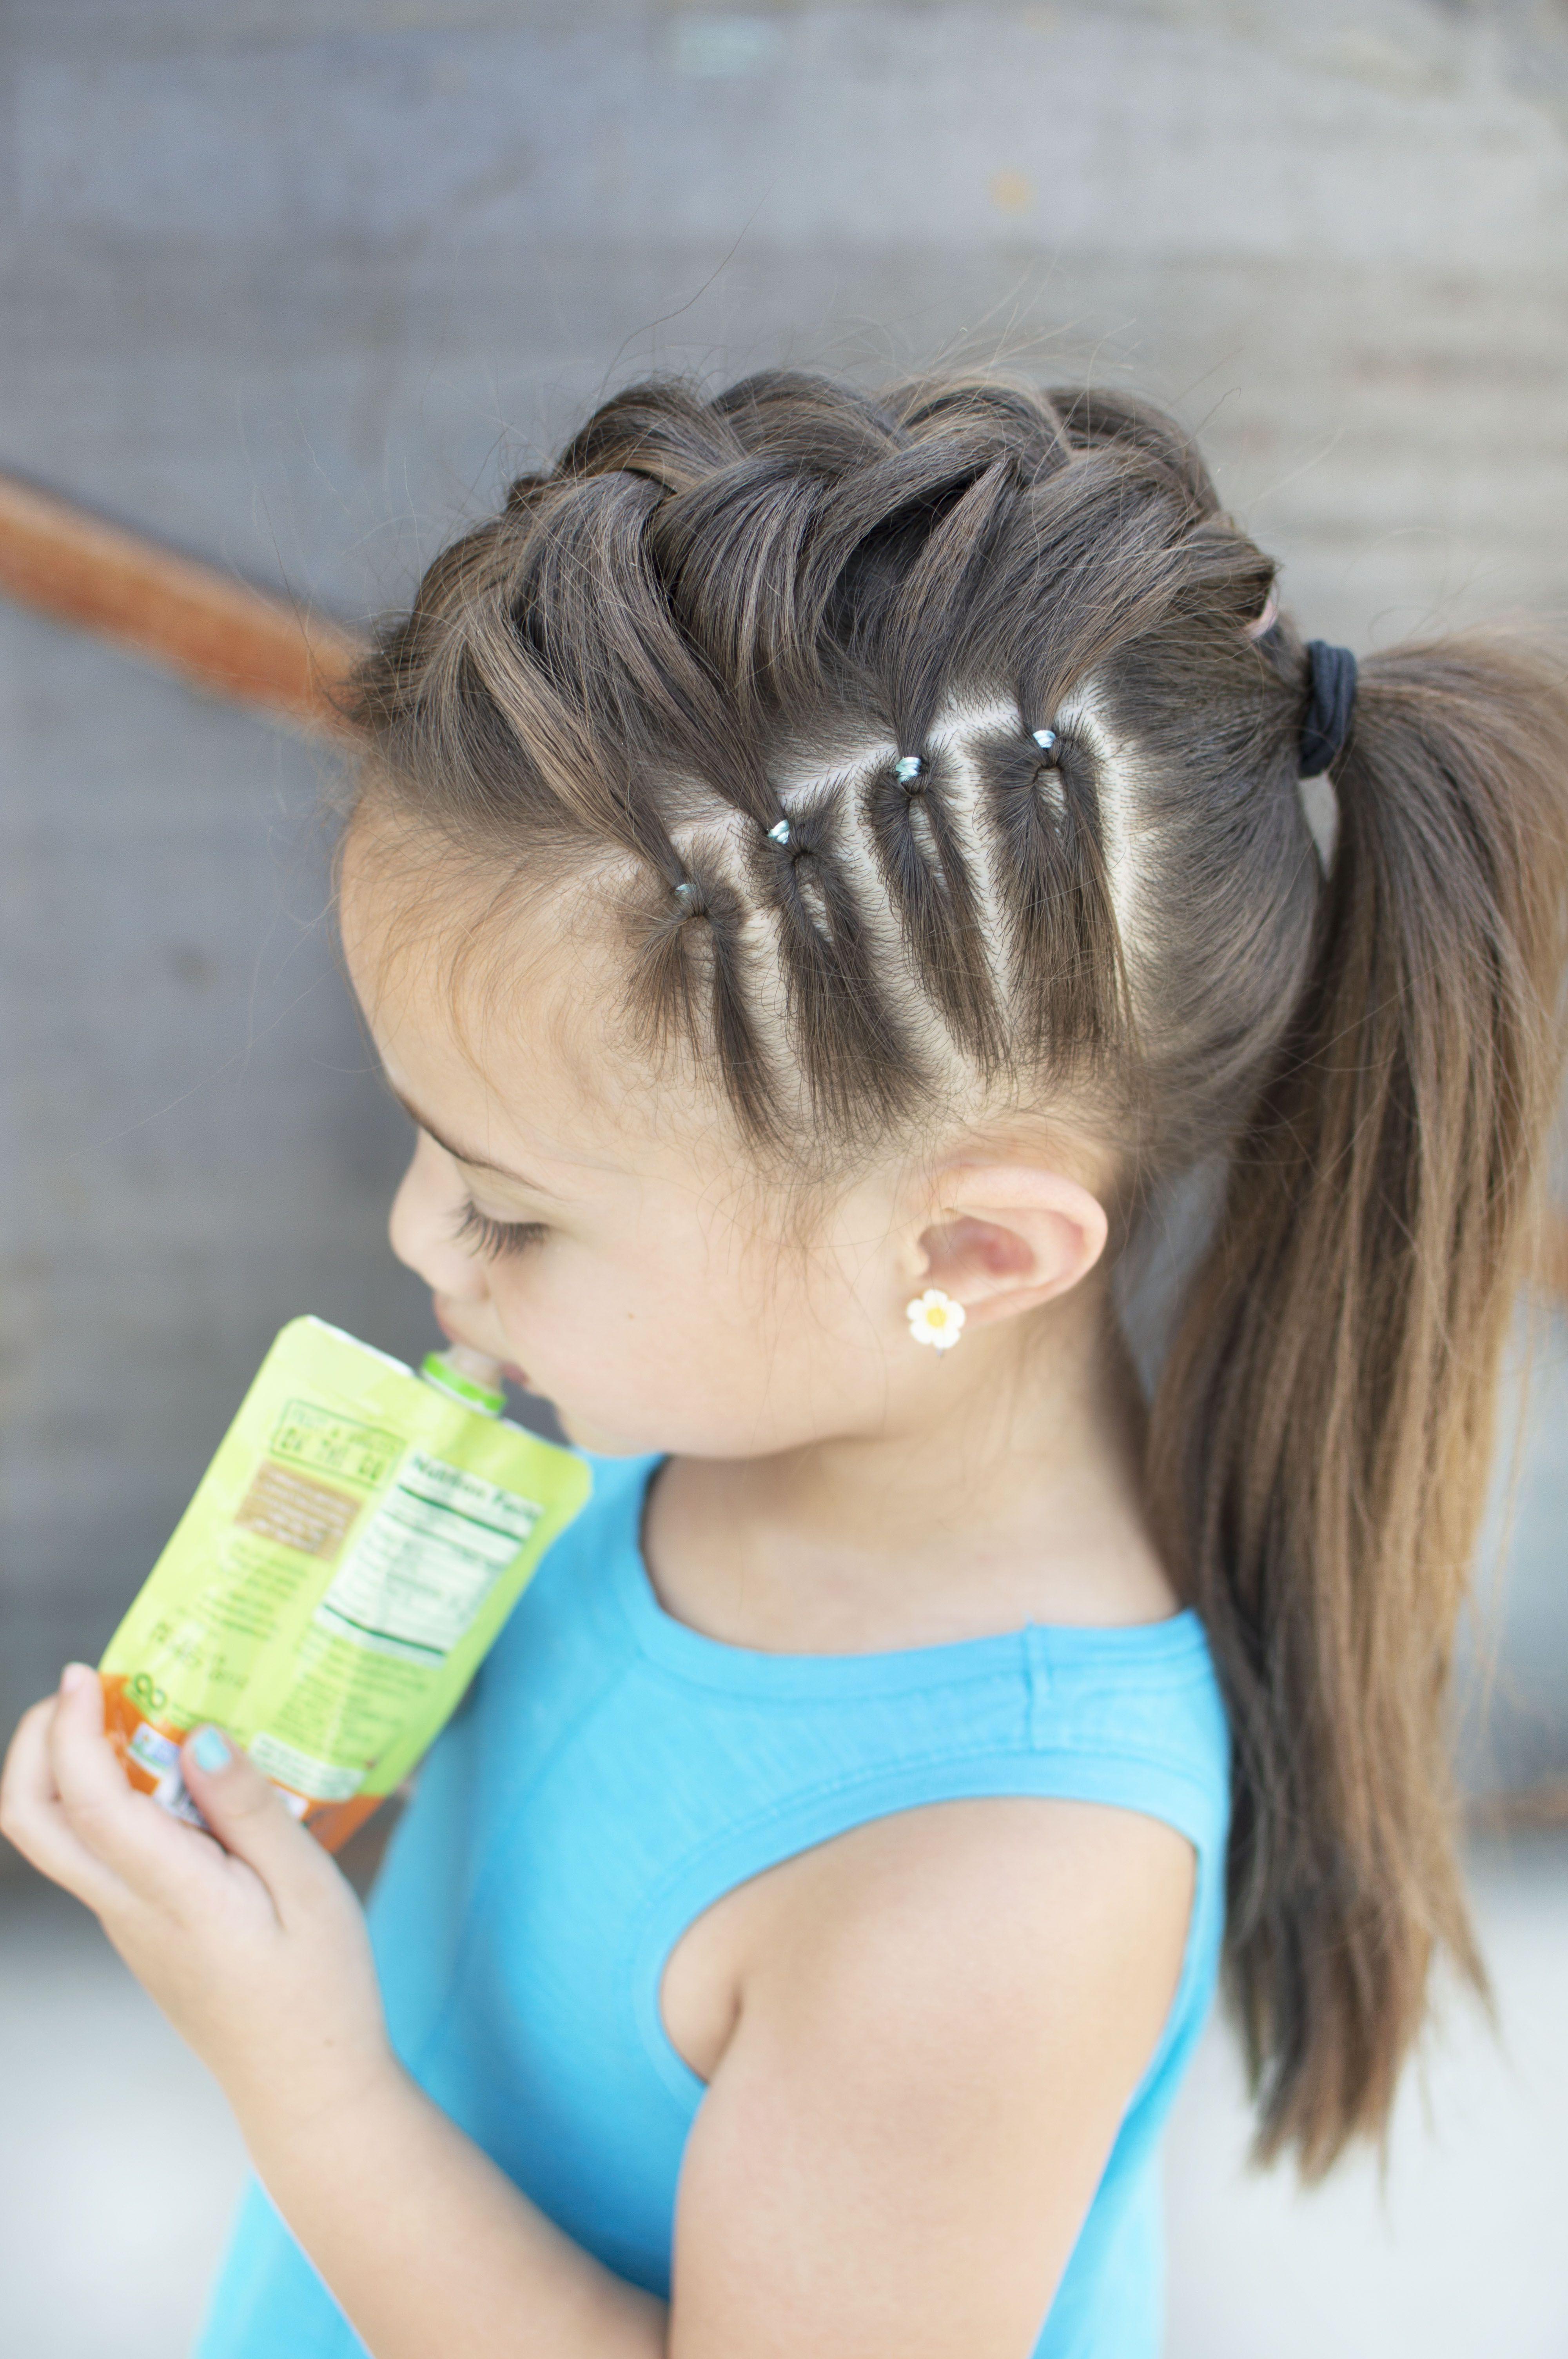 Gallery &8211; Hair To Dream - Hair Beauty